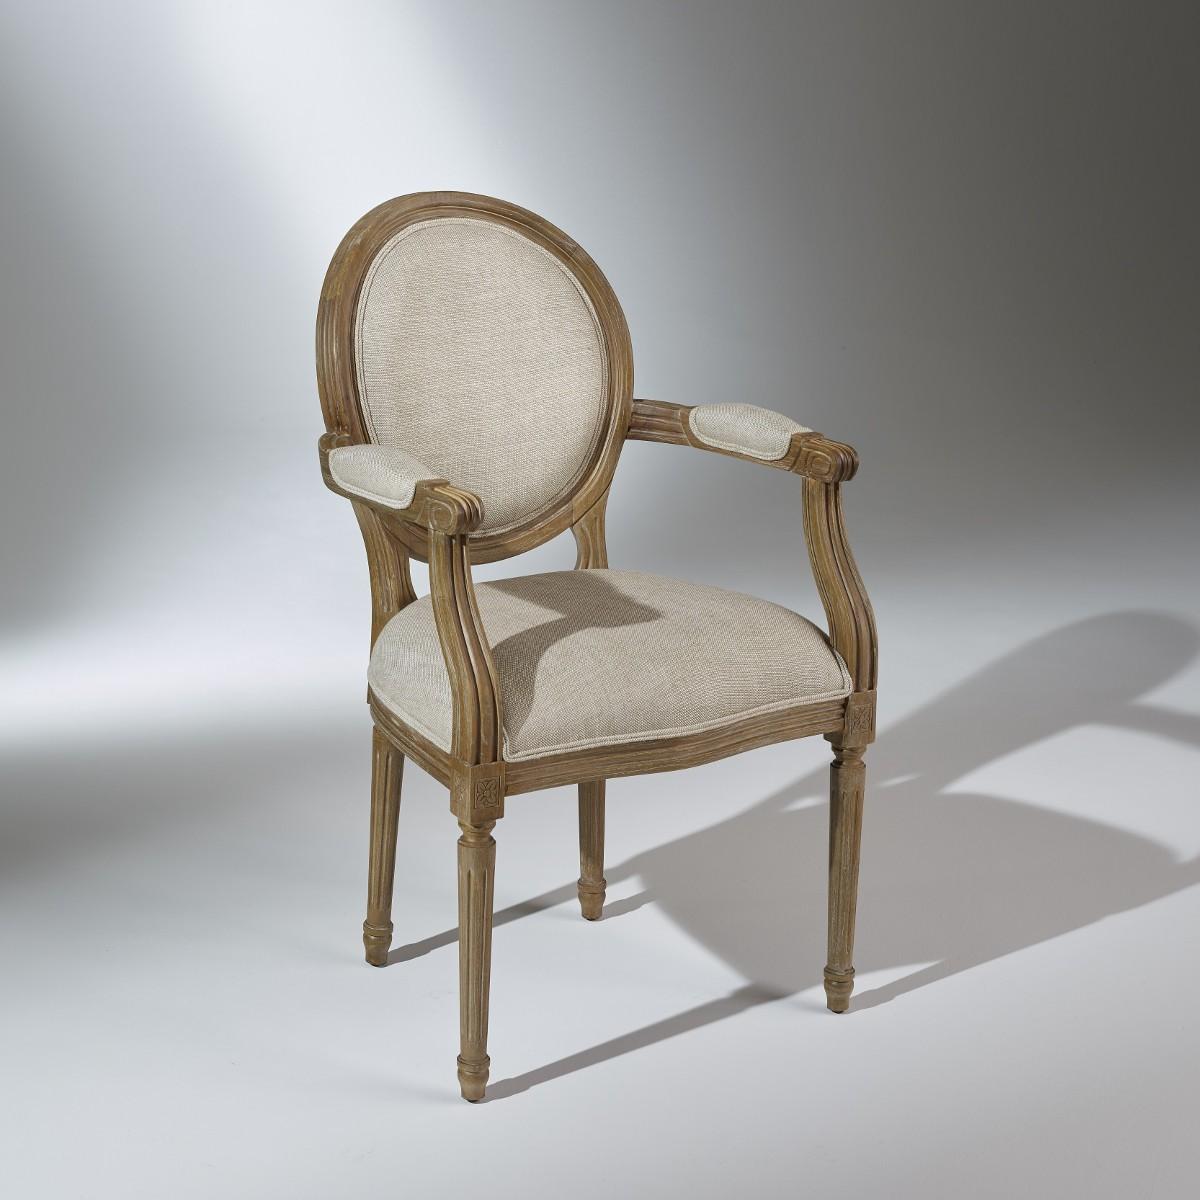 fauteuil medaillon bras patine bois naturel et lin. Black Bedroom Furniture Sets. Home Design Ideas